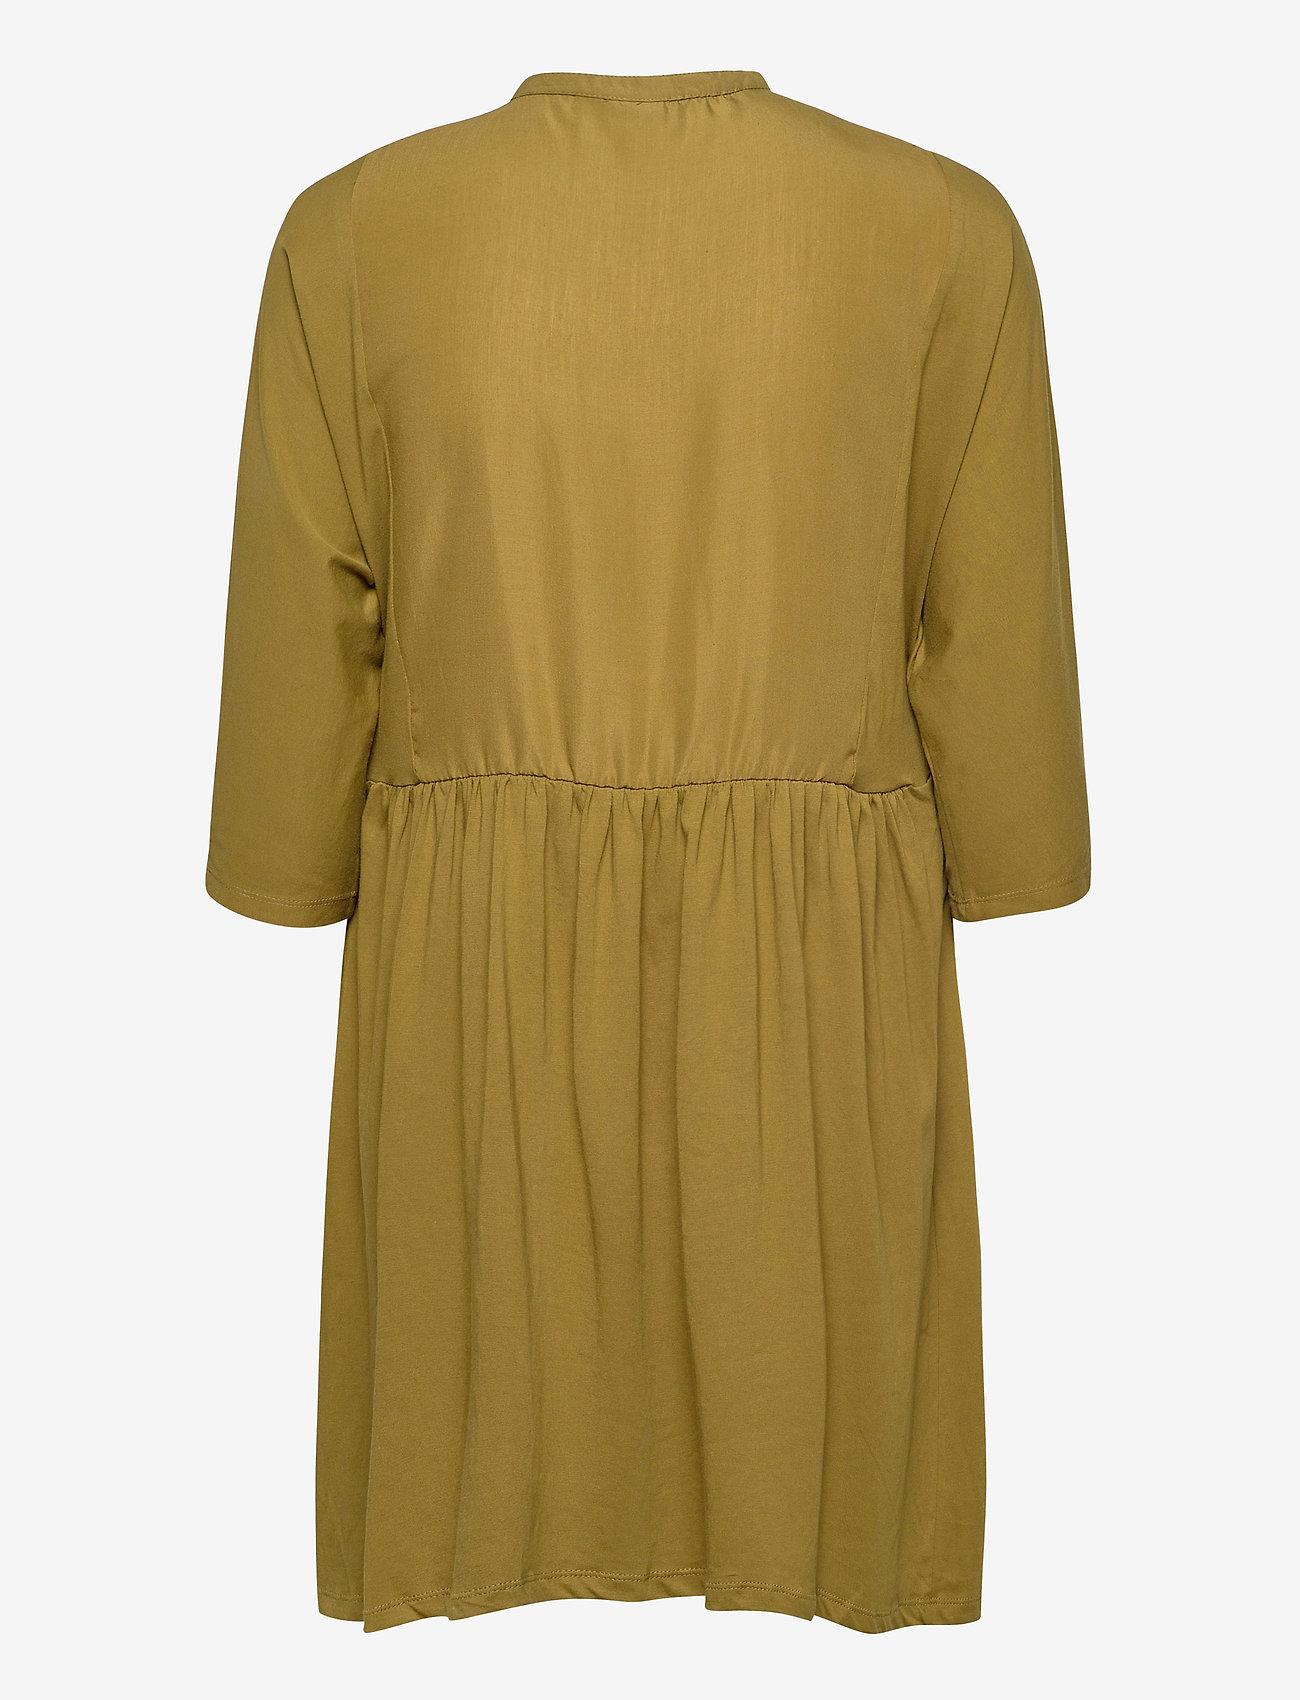 ICHI - IHTANYA DR - everyday dresses - fir green - 1